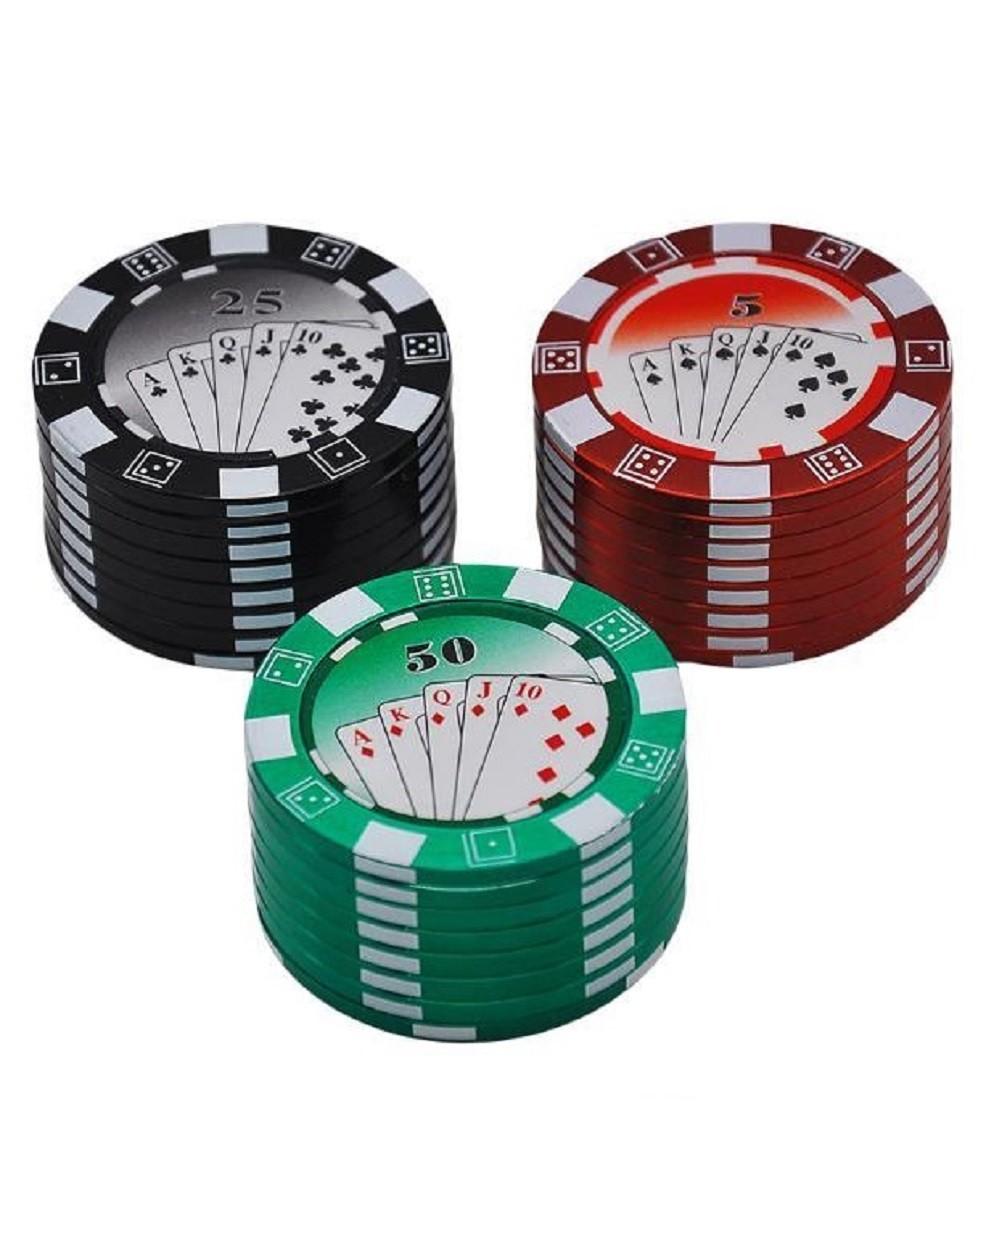 Двухсекционный гриндер Poker Chip (5 см)